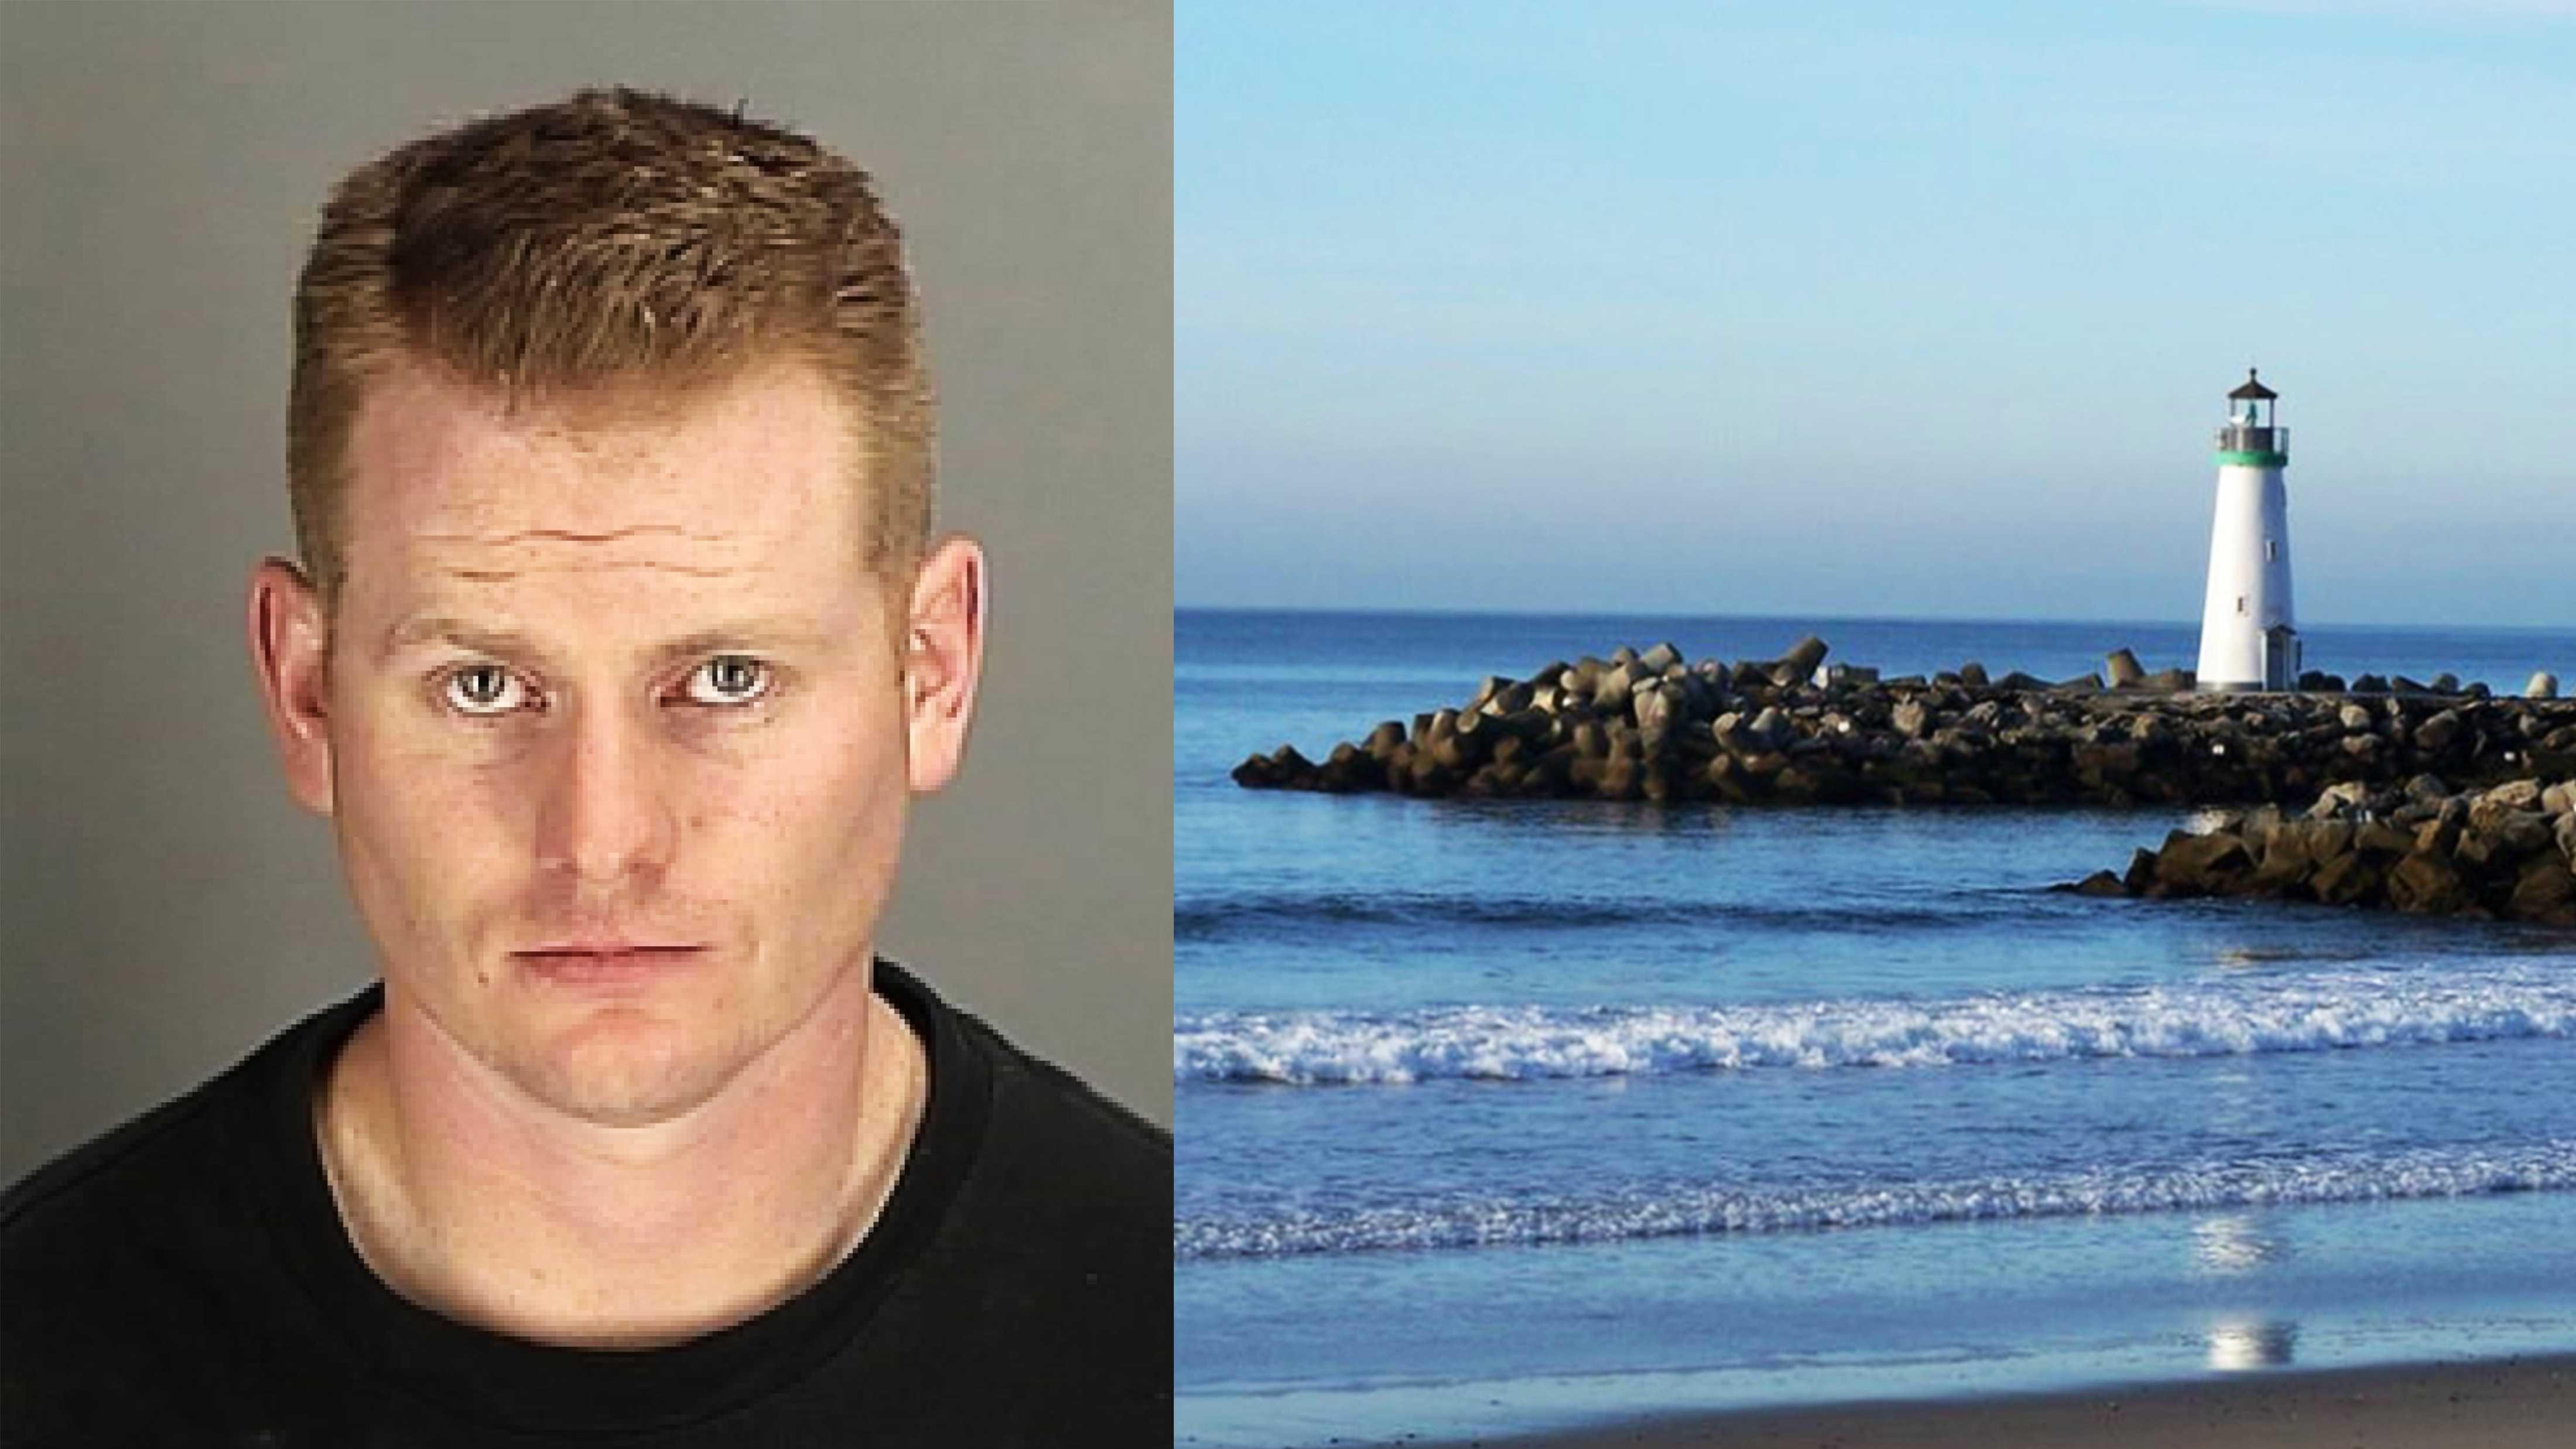 Timothy James Anderson, 30, is the Santa Cruz Harbor's deputy harbormaster.